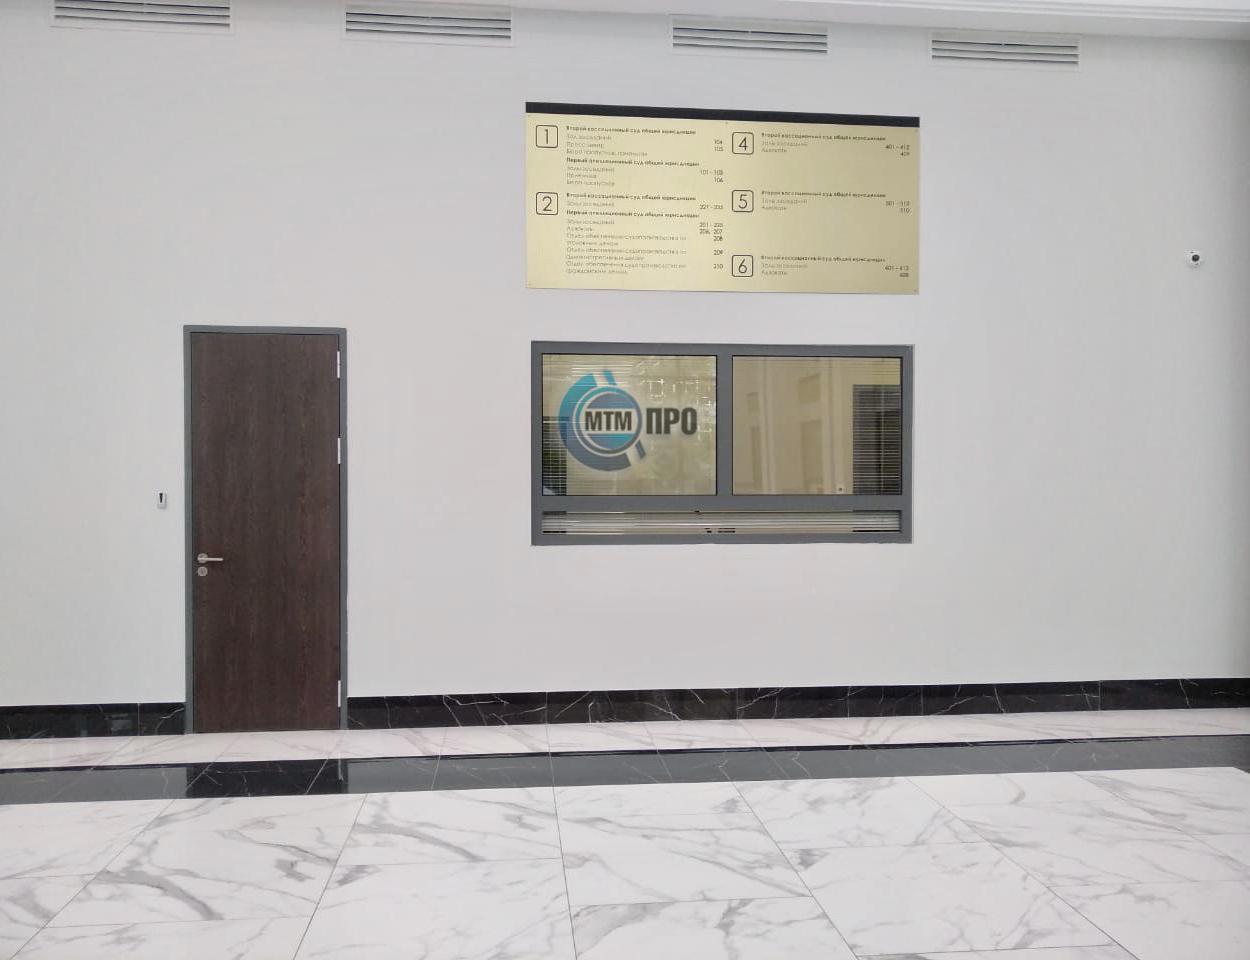 Бюро пропусков в суде 4